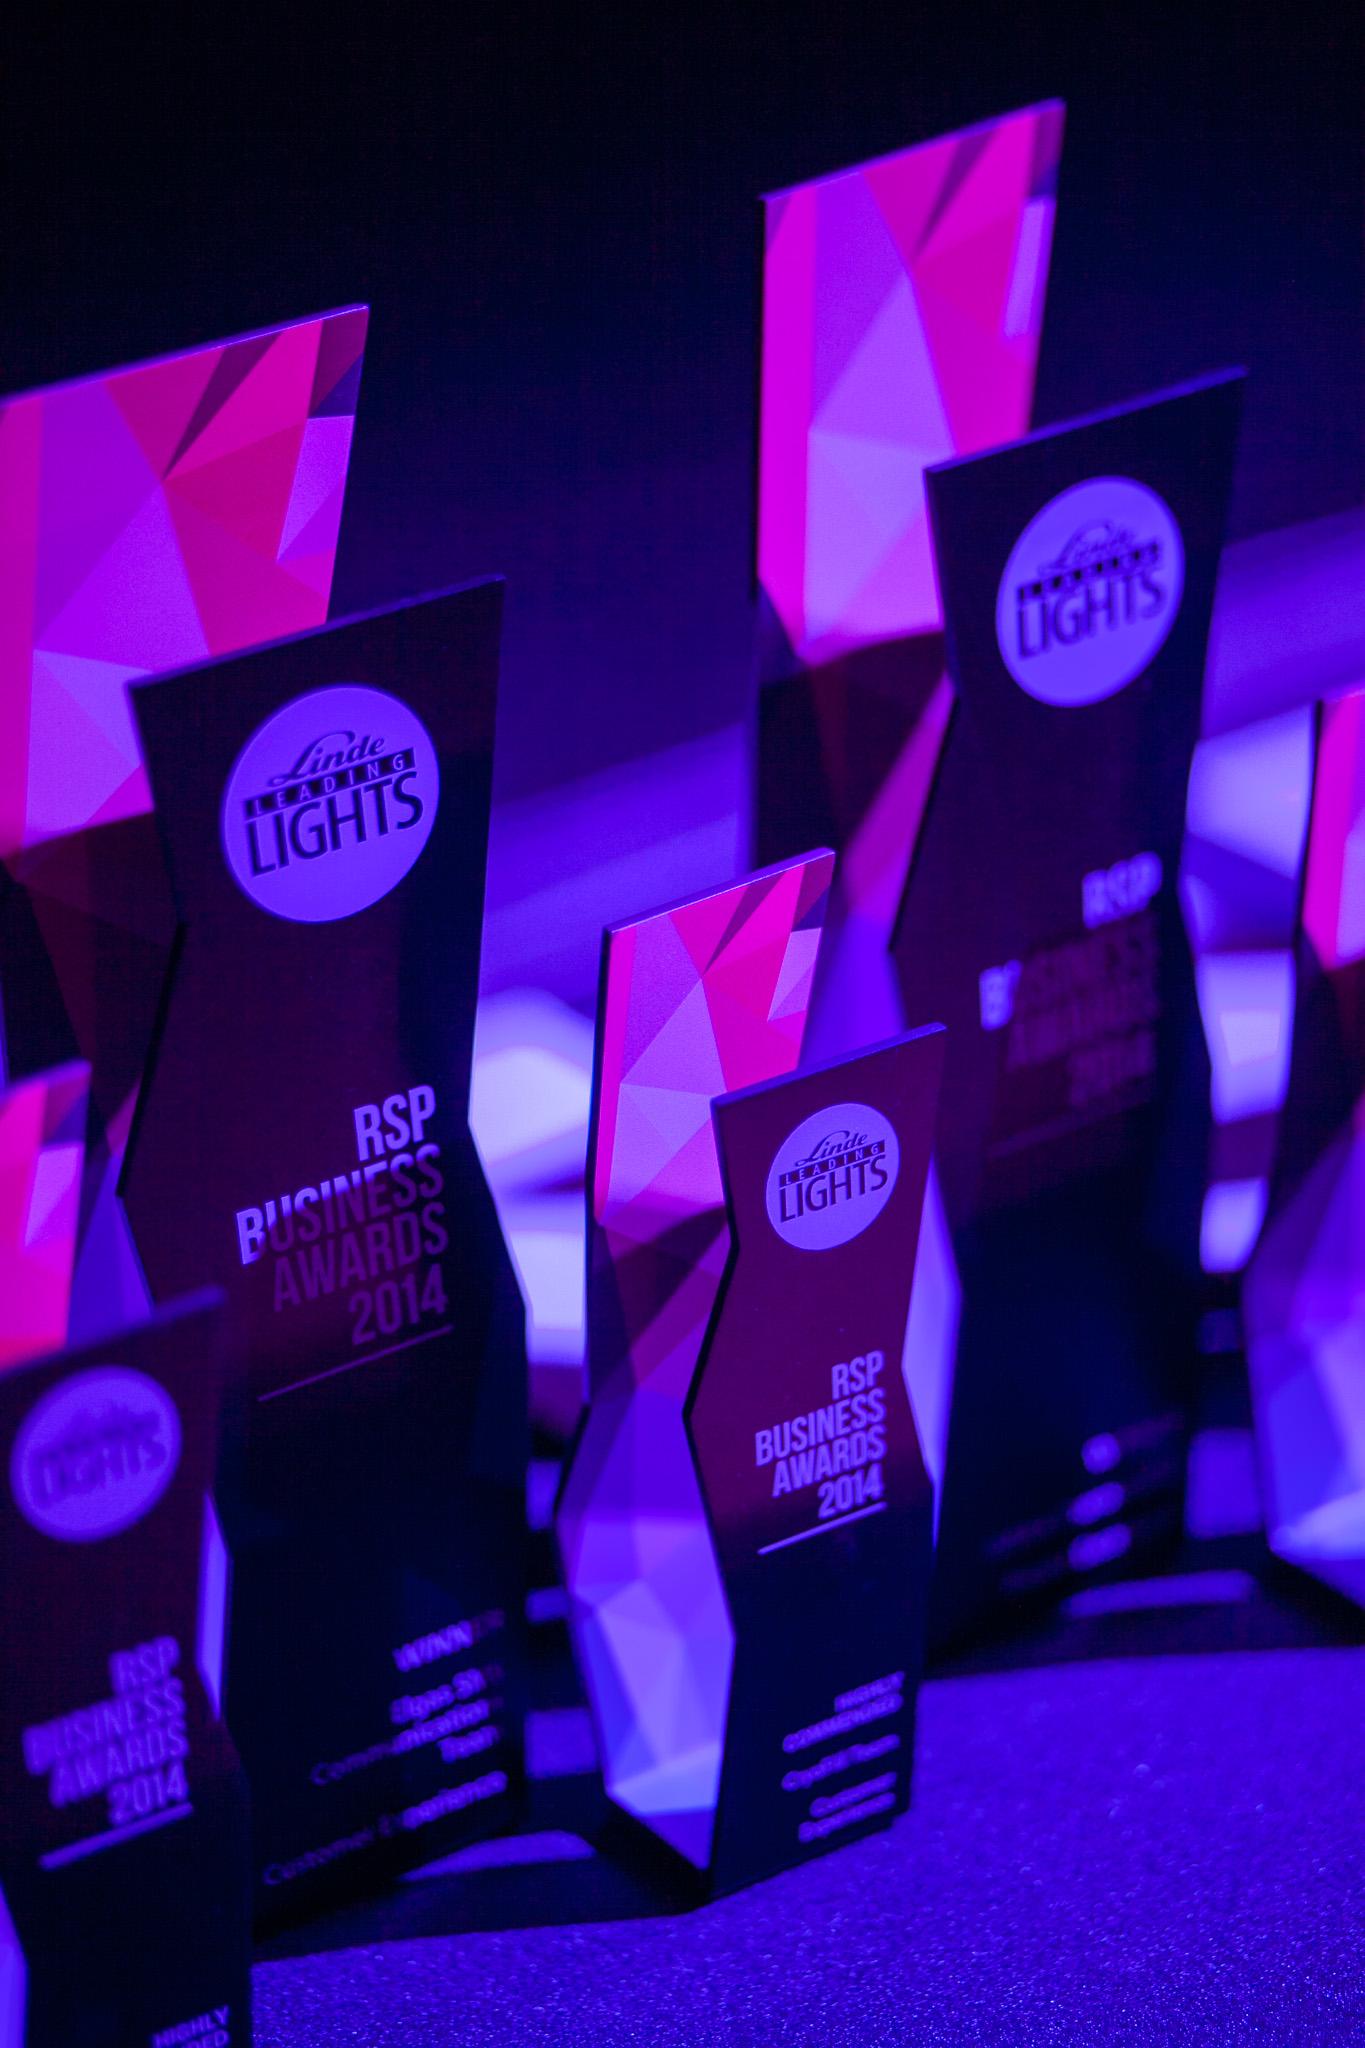 Belle-Laide Events and BOC - RSP Business Awards custom trophy awards